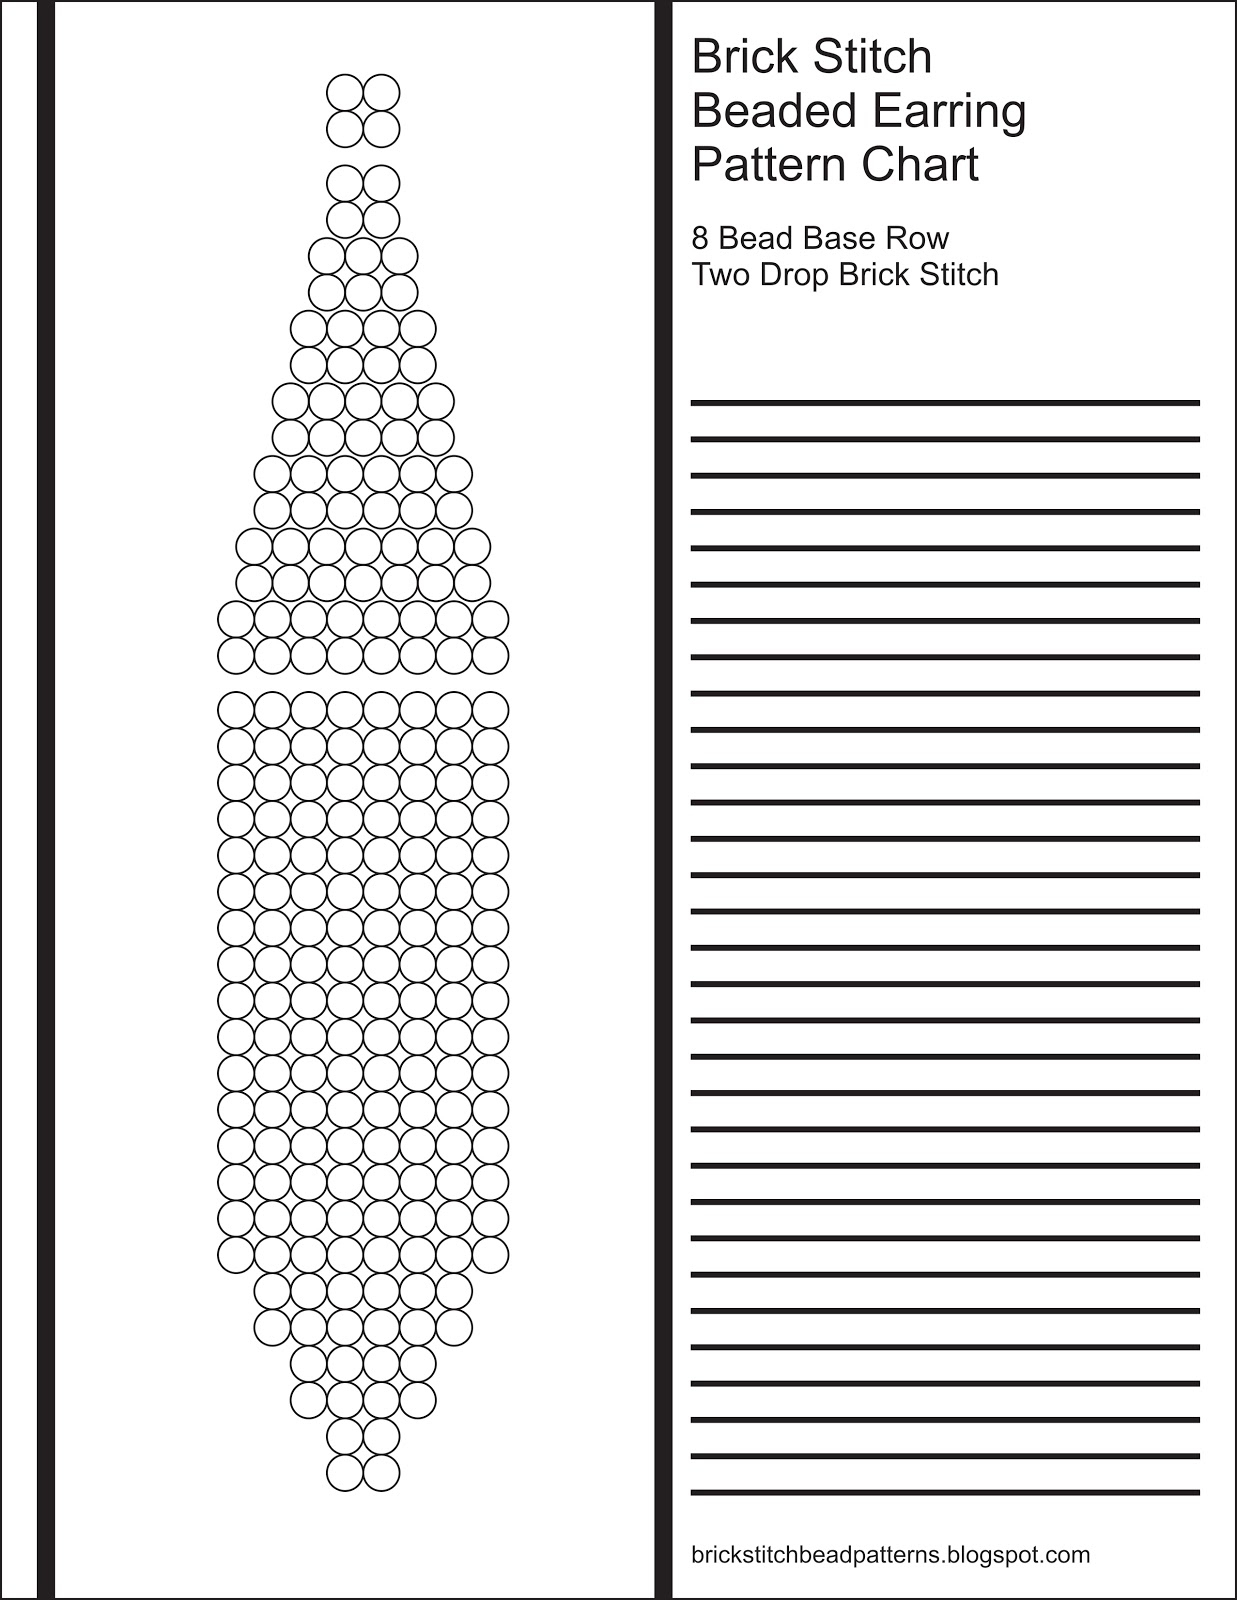 Brick Stitch Bead Patterns Journal: 8 Bead Base Row 2 Drop Blank - Free Printable Beading Patterns